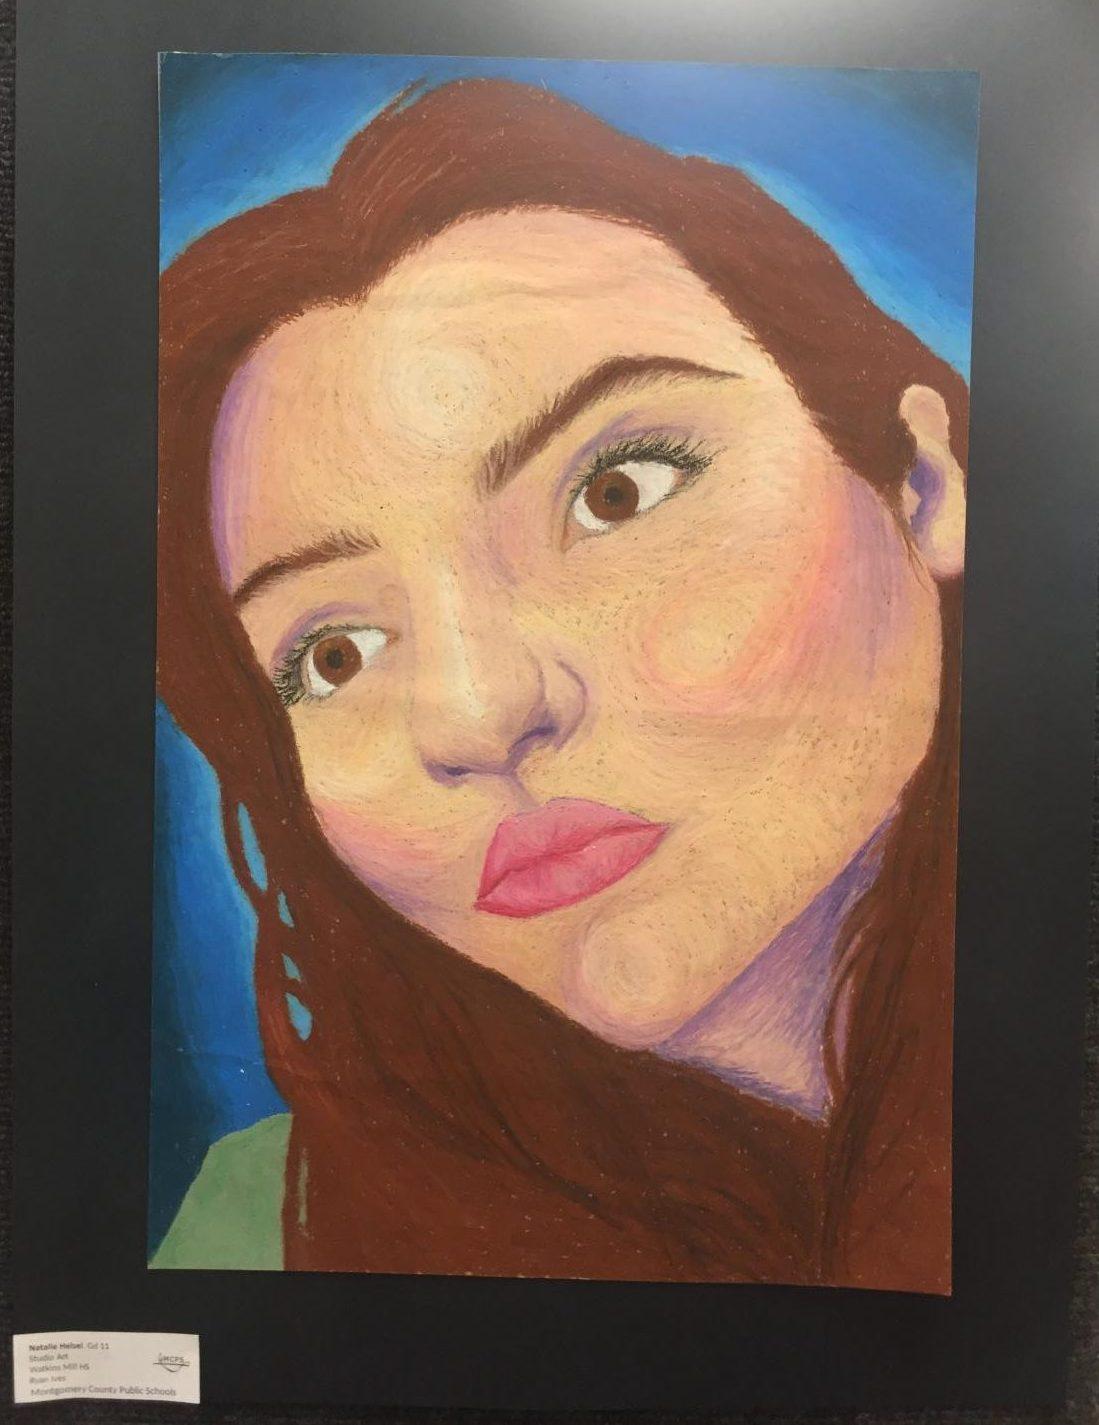 Self+portrait+artwork+by+Junior+Natalie+Helsel+of+herself+in+the+Watkins+Mill+High+School+Art+Show+2019